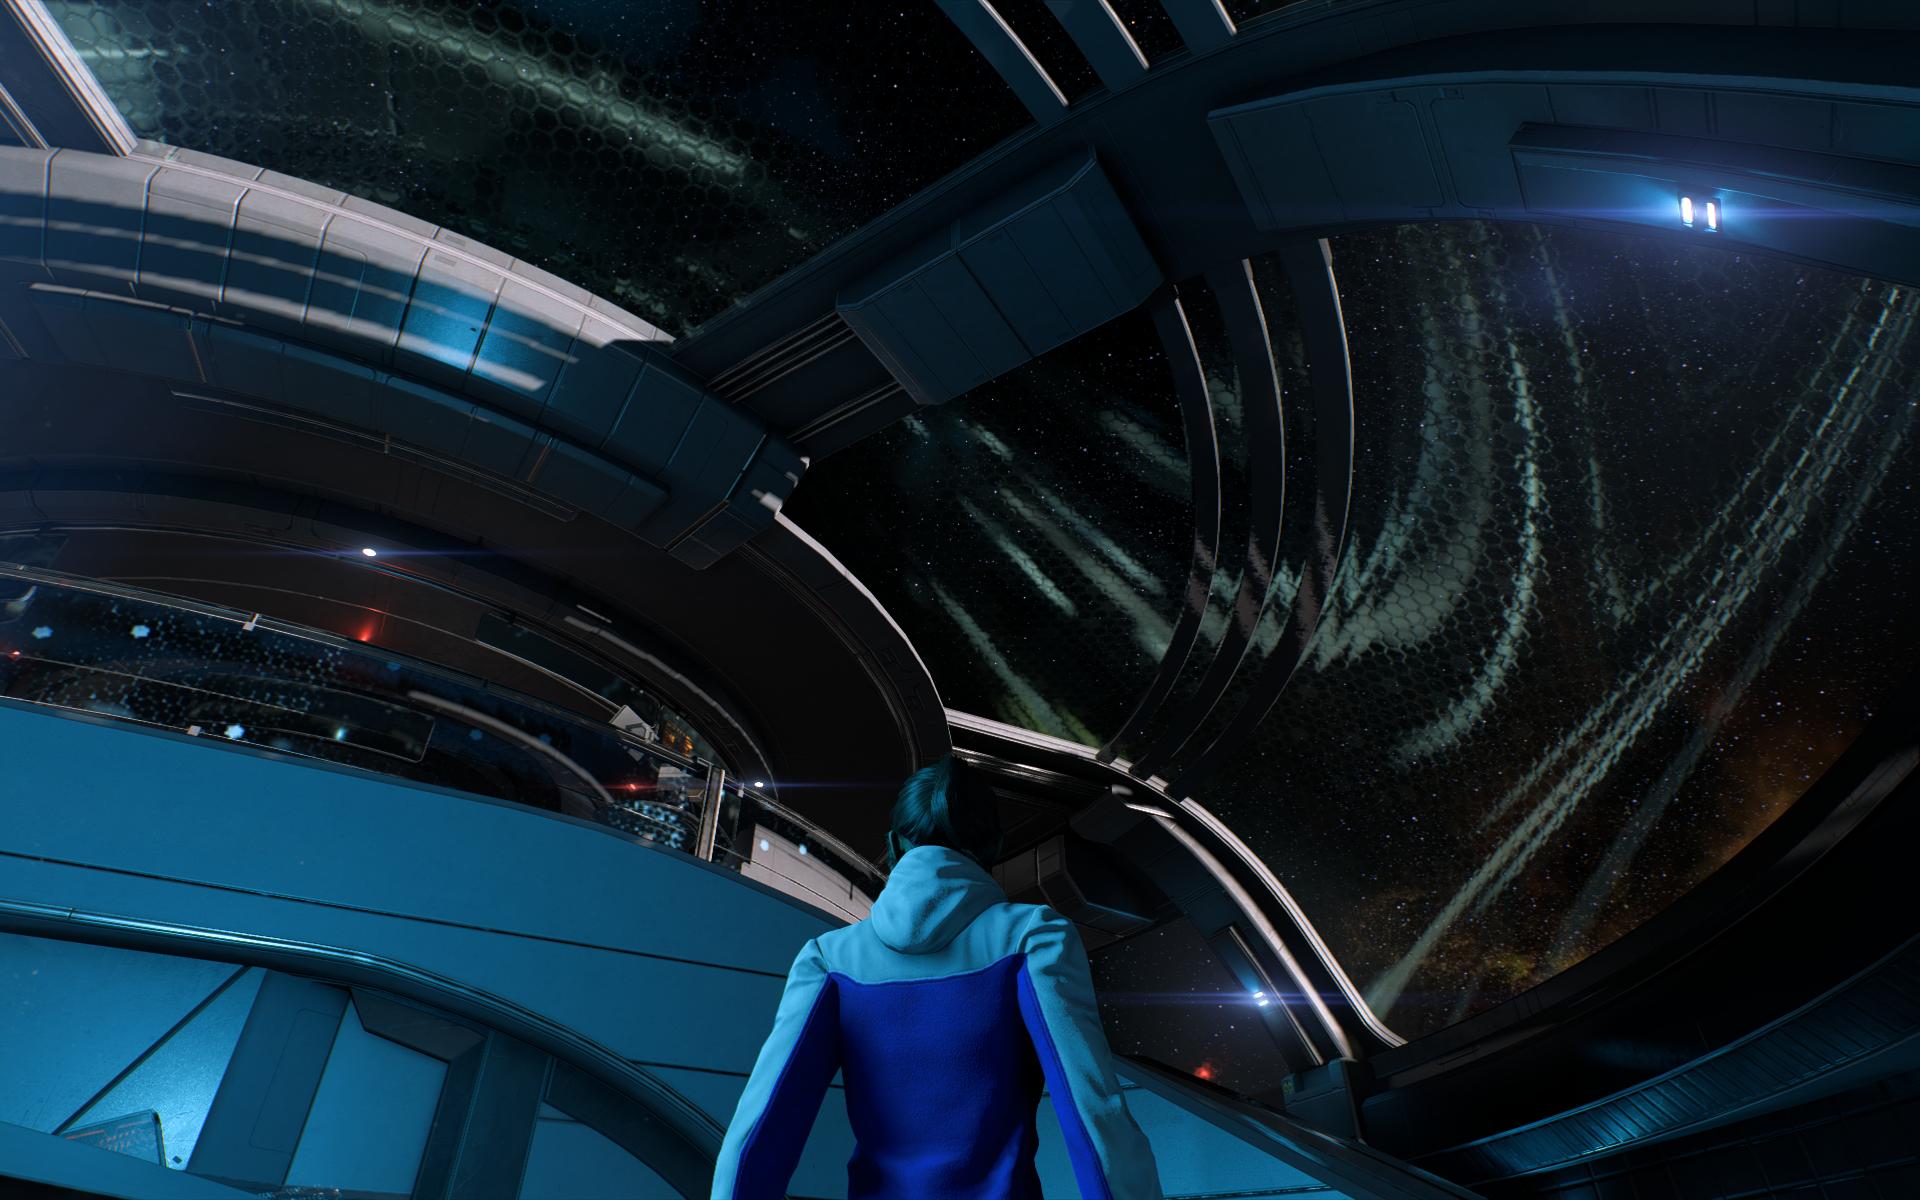 Mass Effect Andromeda Screenshot  - 23.46.07.27.png - Mass Effect: Andromeda